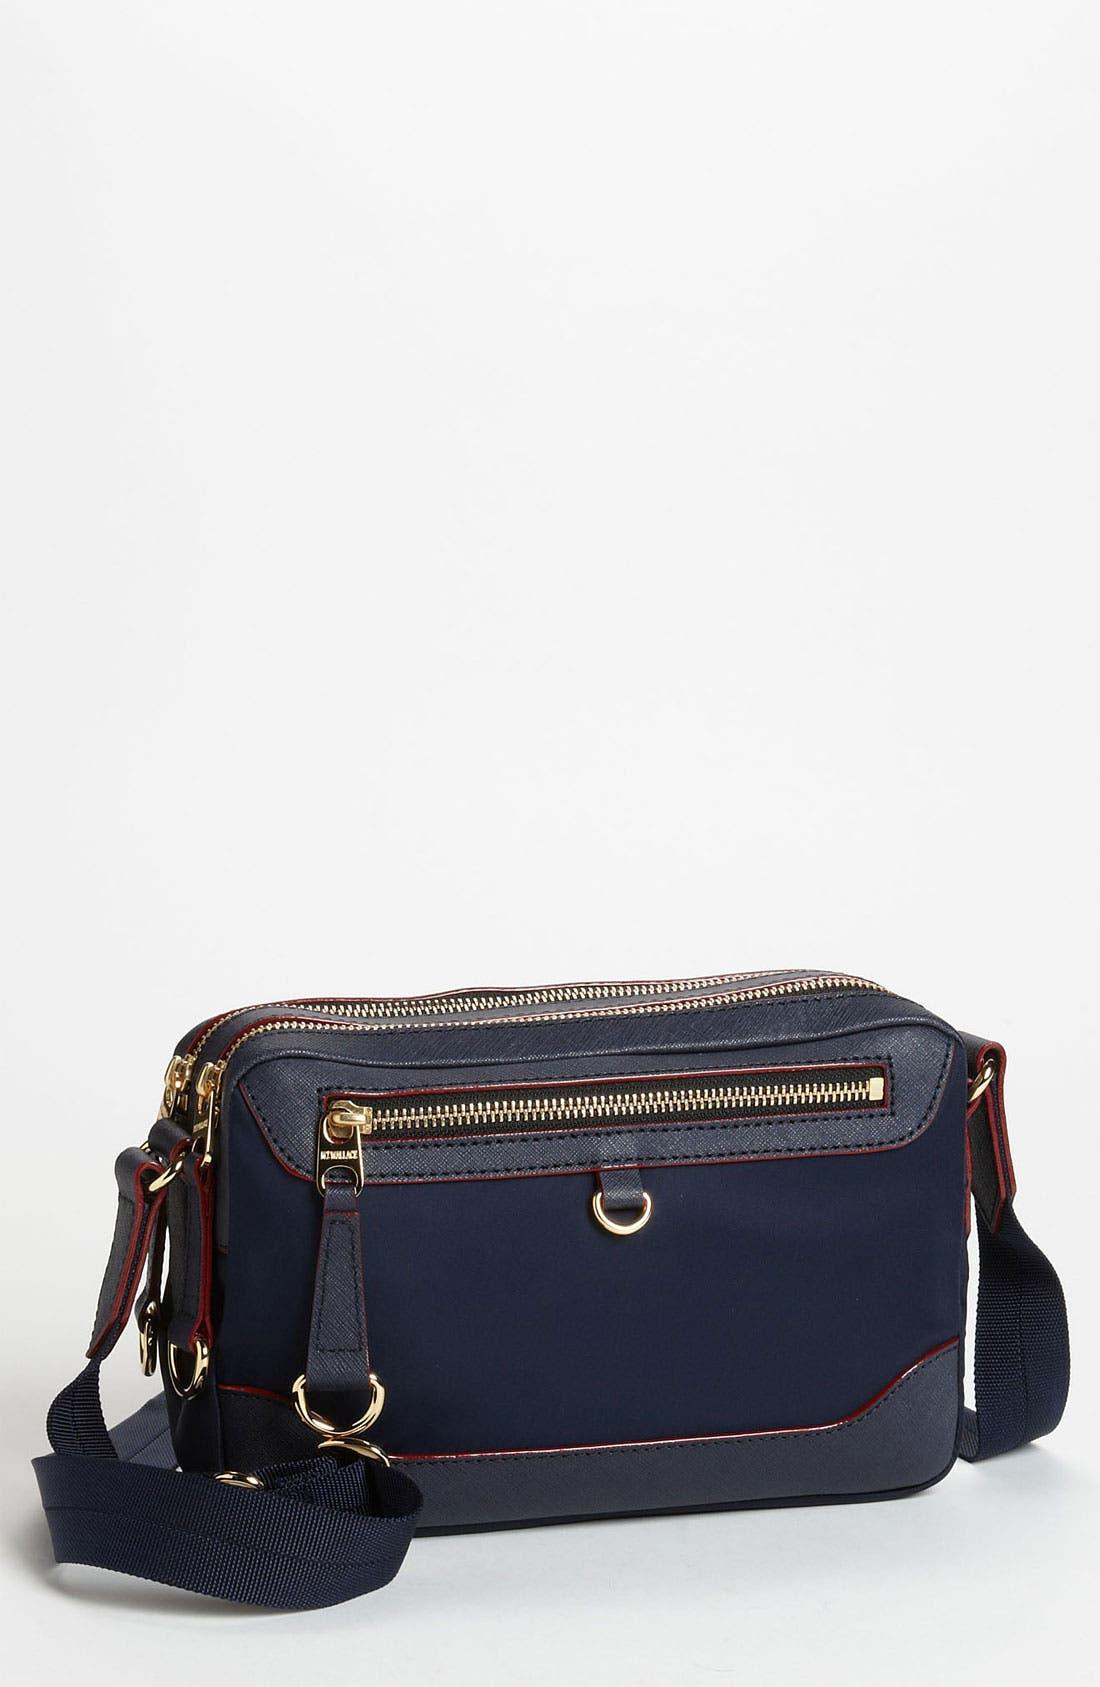 Main Image - MZ Wallace 'Lila' Crossbody Bag